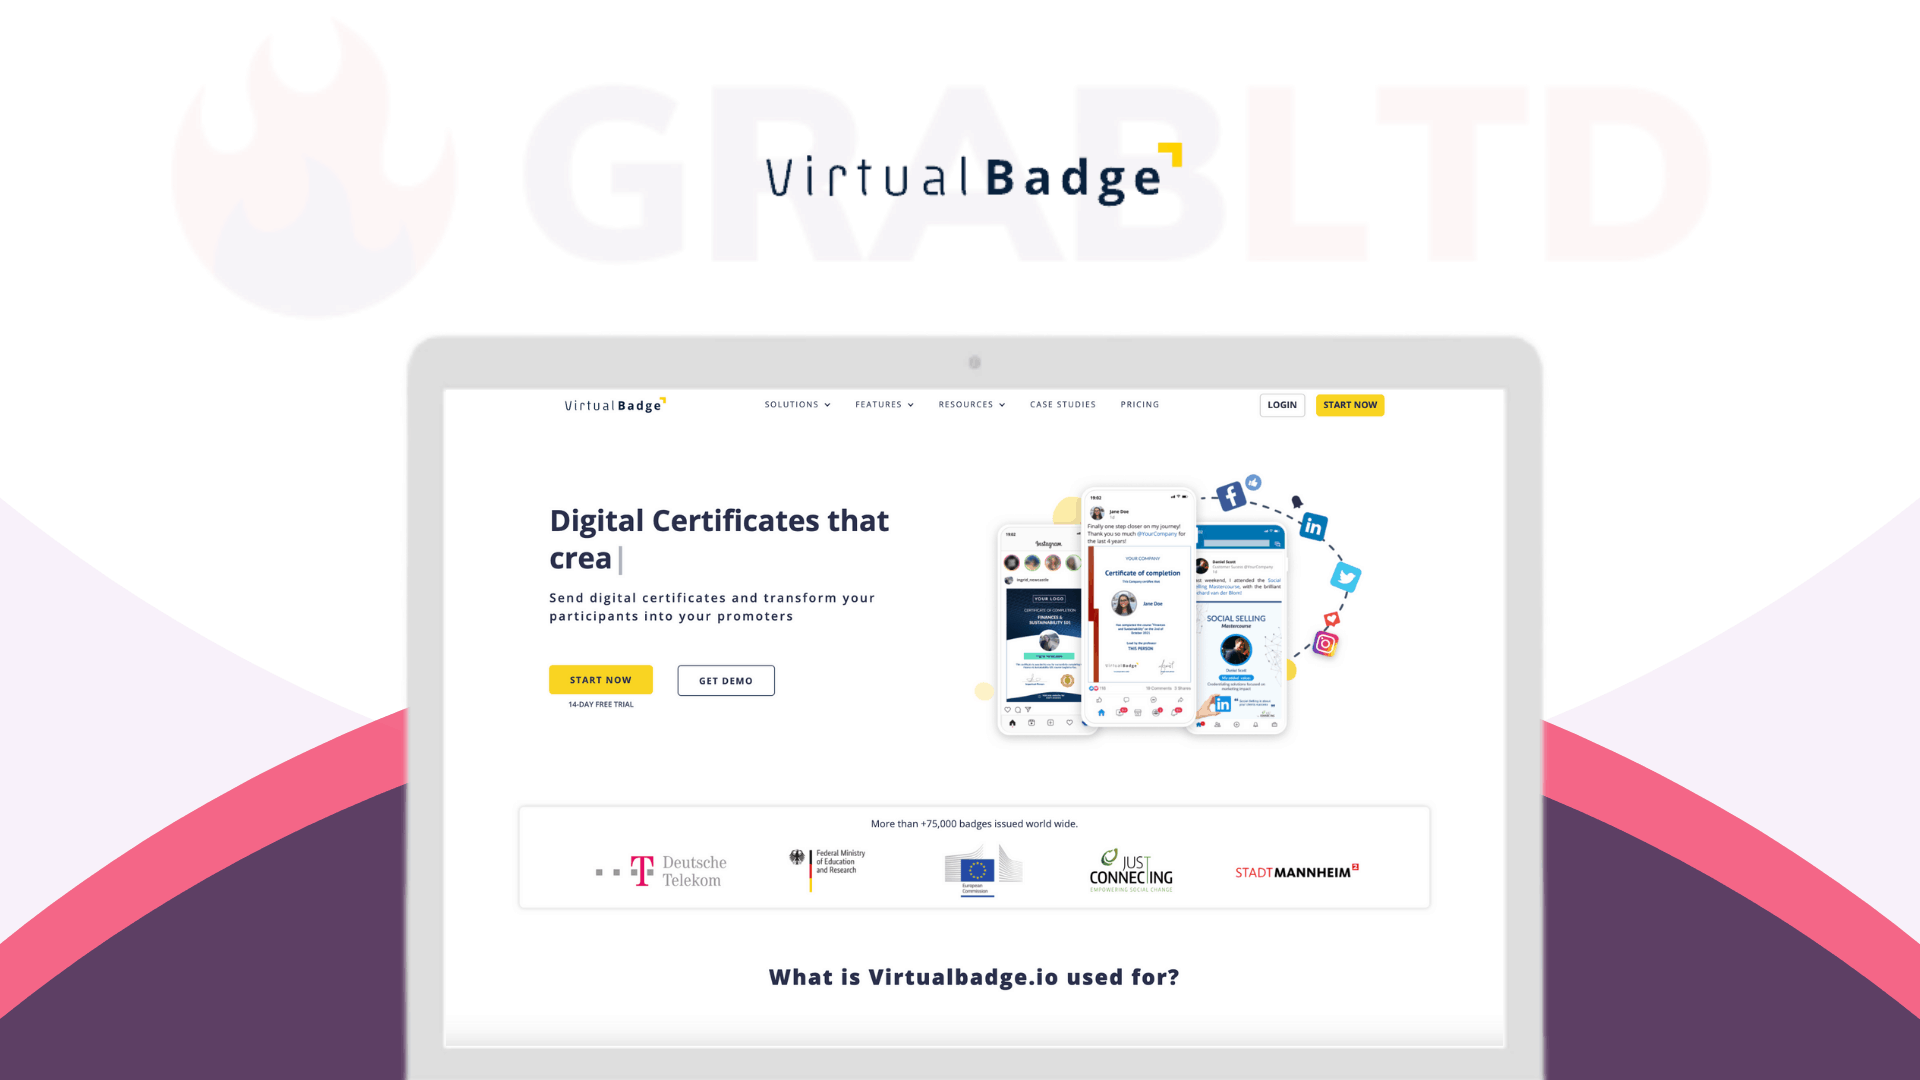 Virtualbadge | Create Digital Certificates & Virtual Badges 1